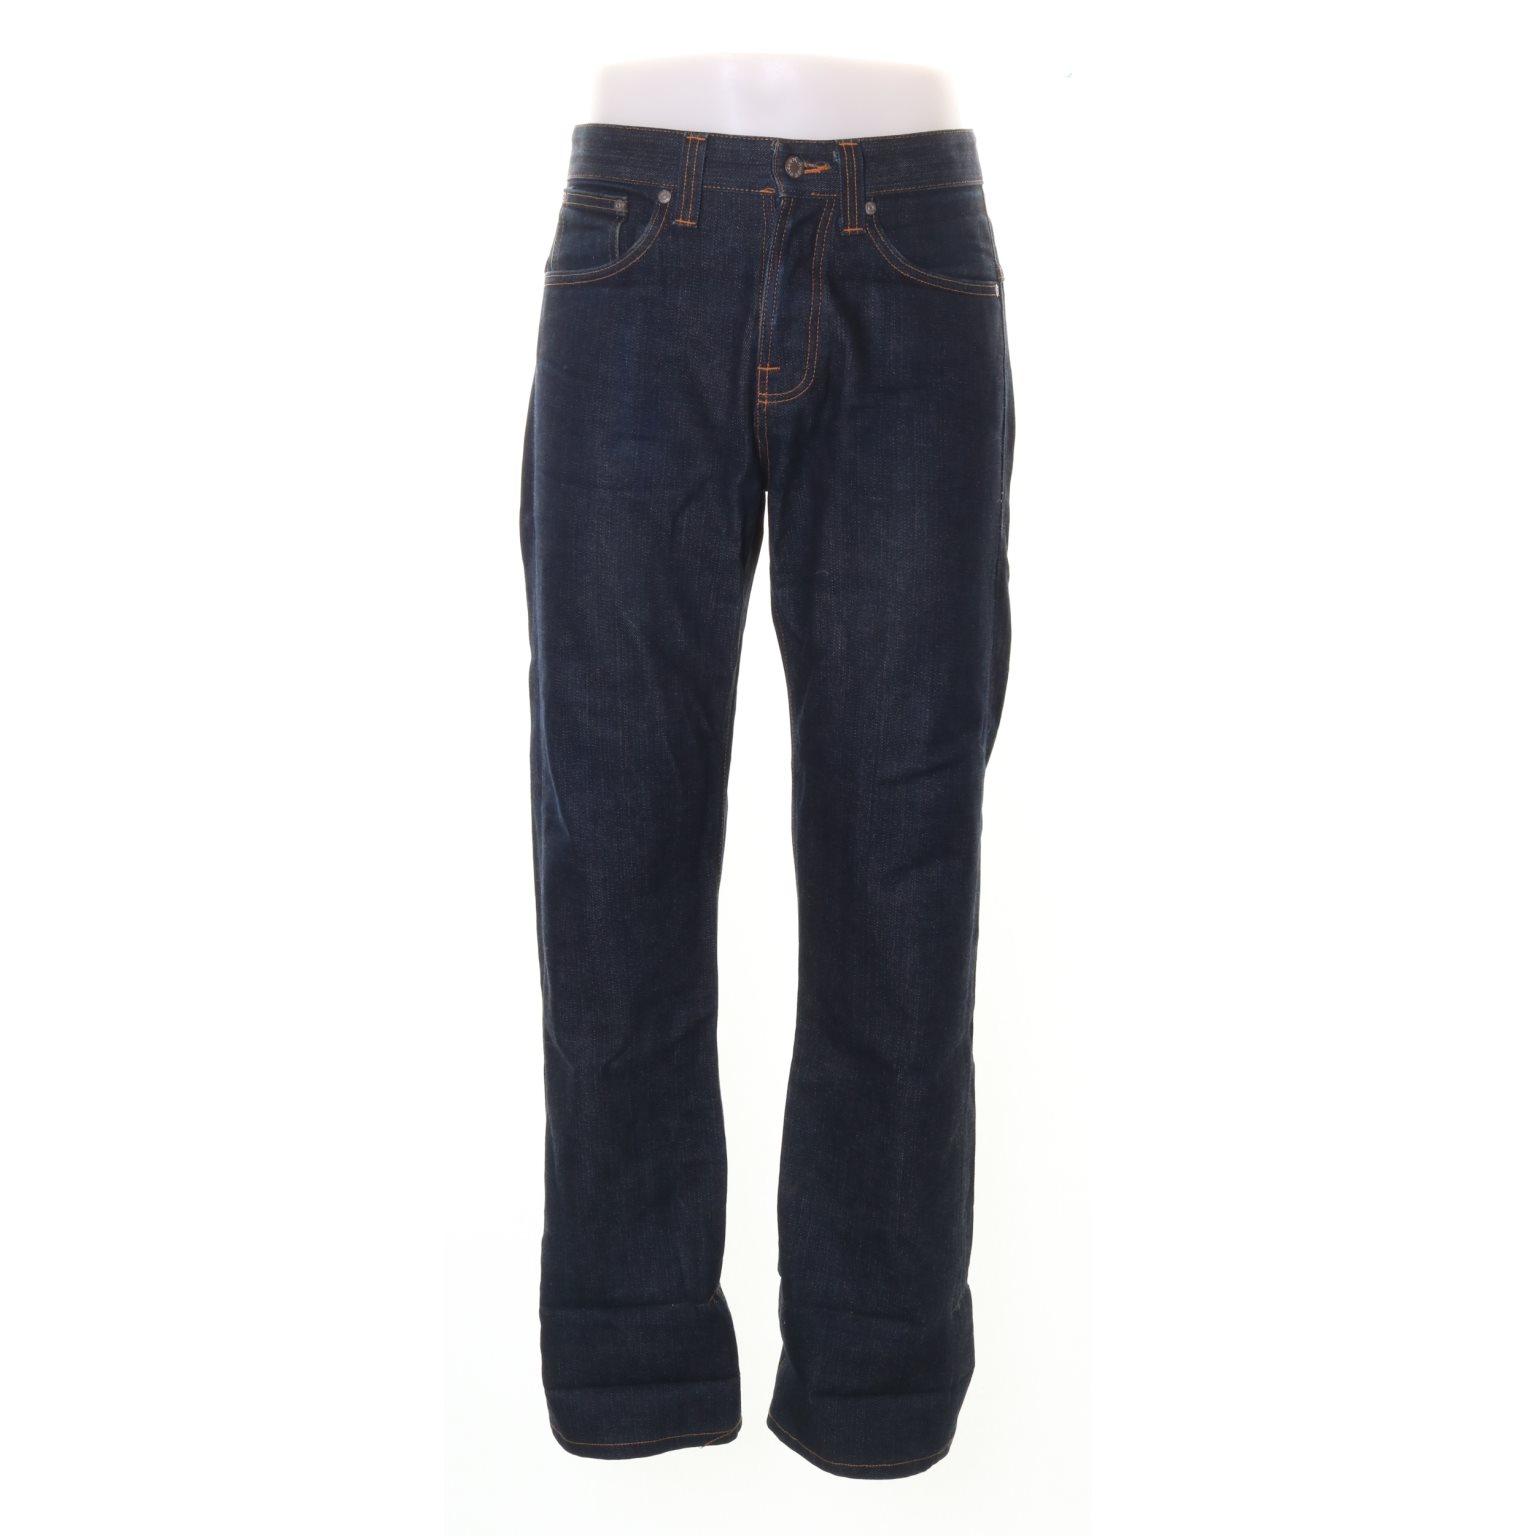 Nudie Jeans, Jeans, Strl: 29/32, Mörkblå